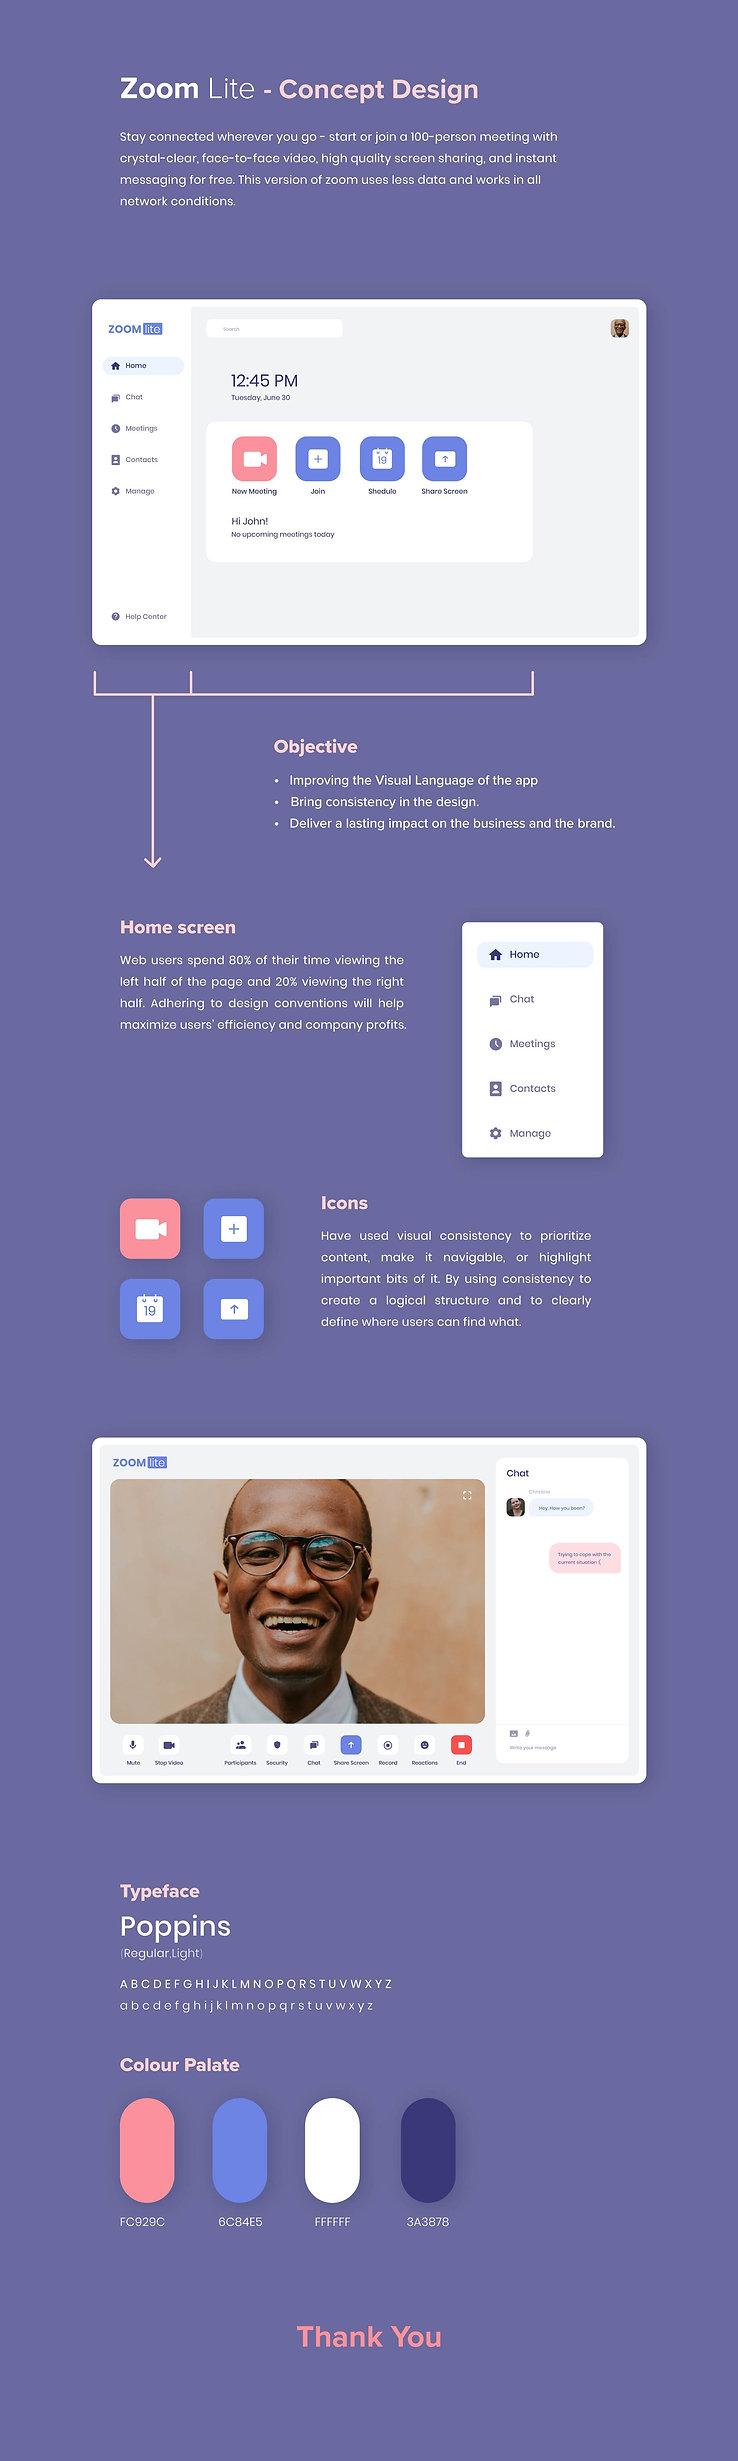 zoom-redesign-mockup.jpg